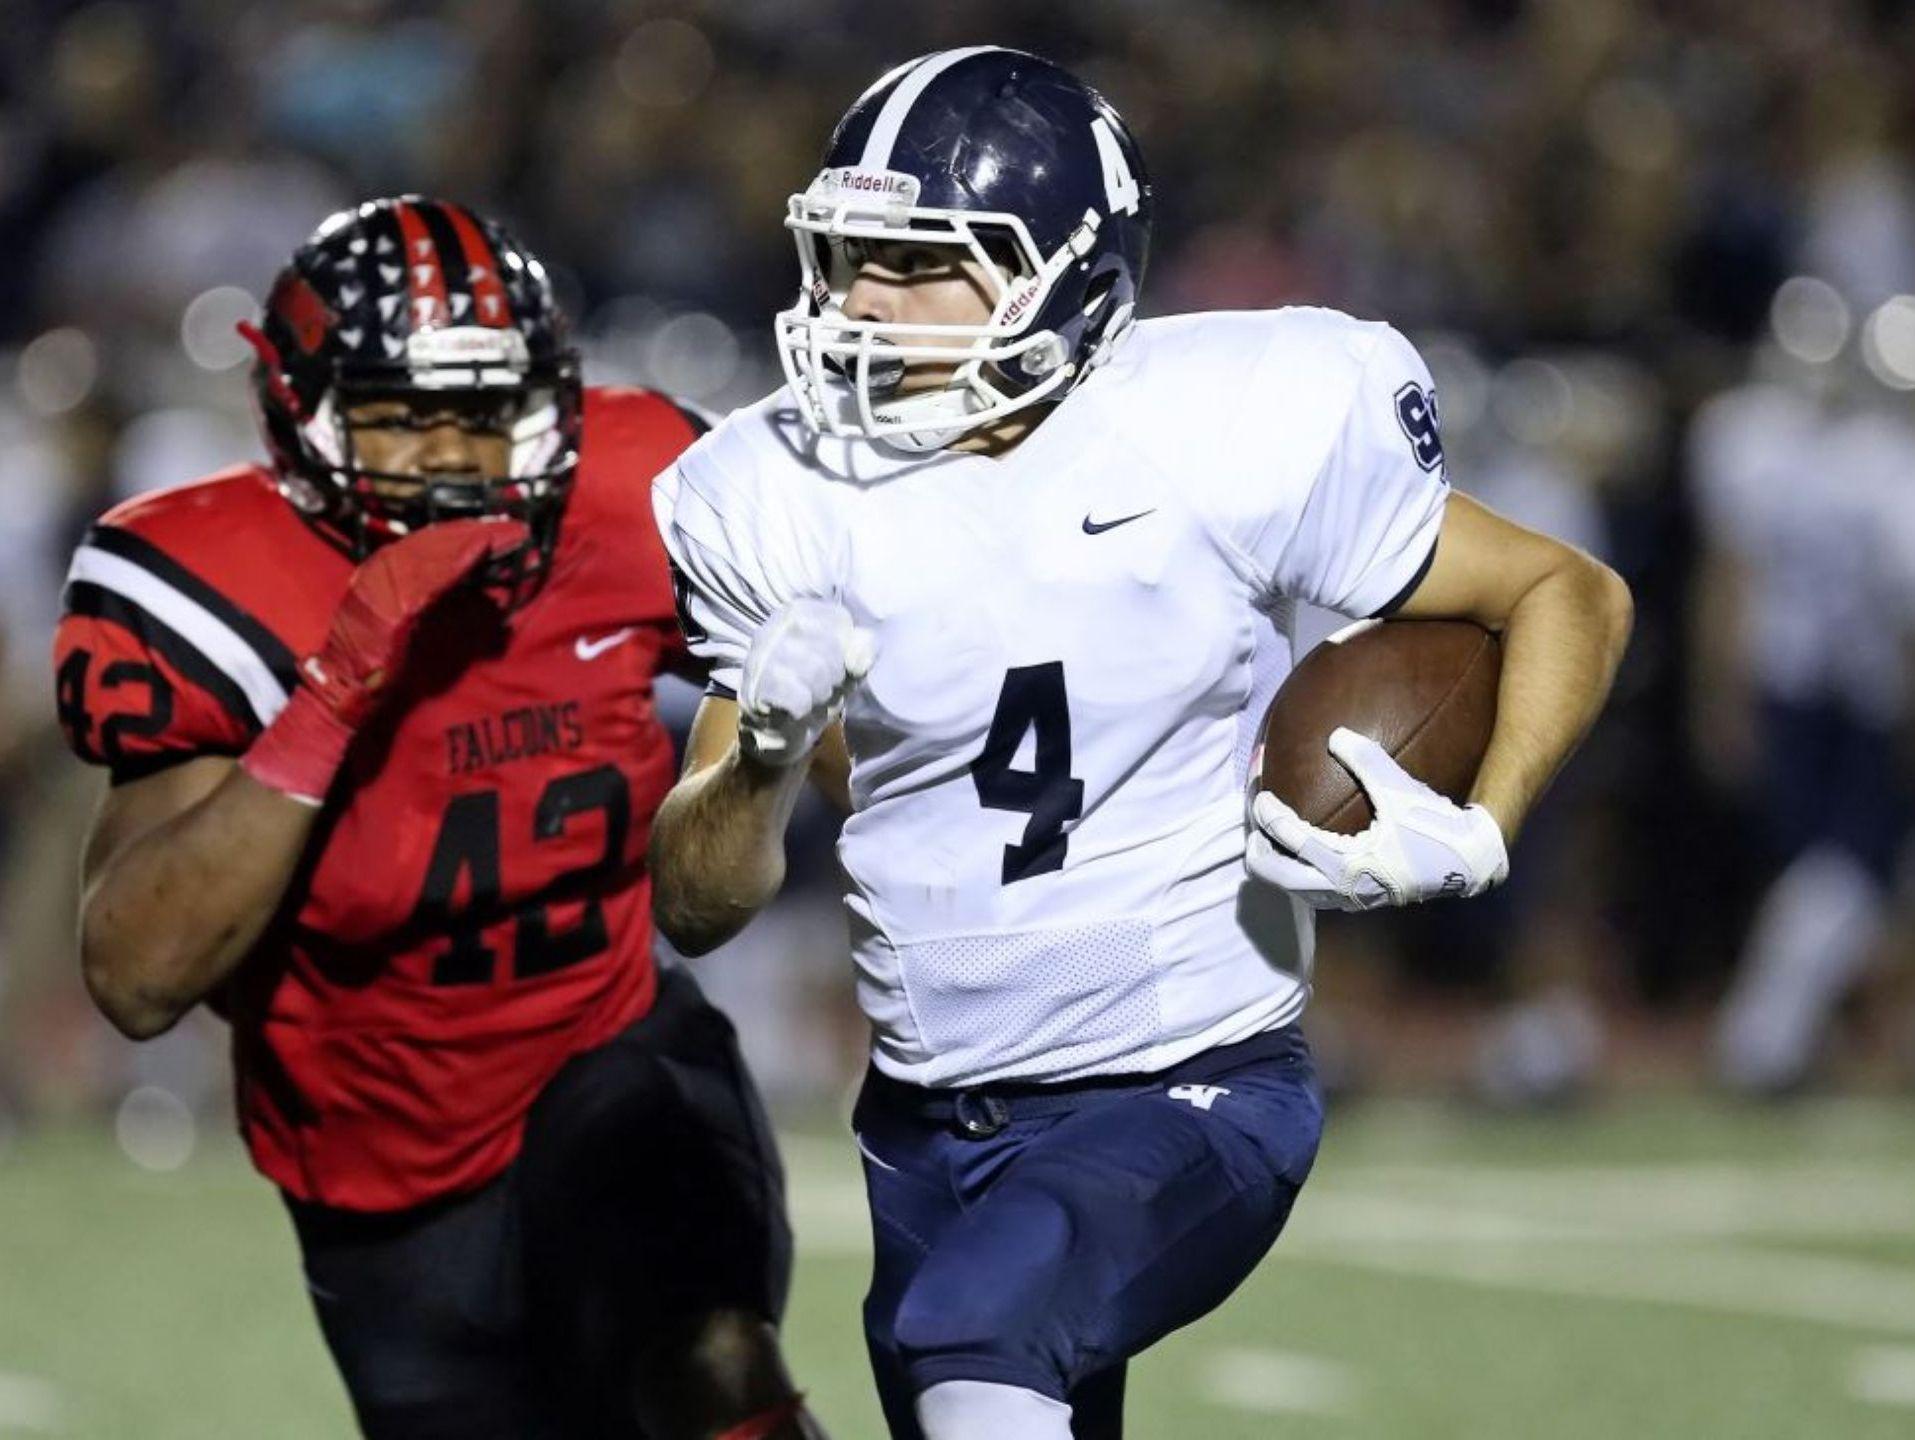 Smithson Valley senior wide receiver Matt Sandoval, on the run against Stevens, caught two TD passes against the Falcons.